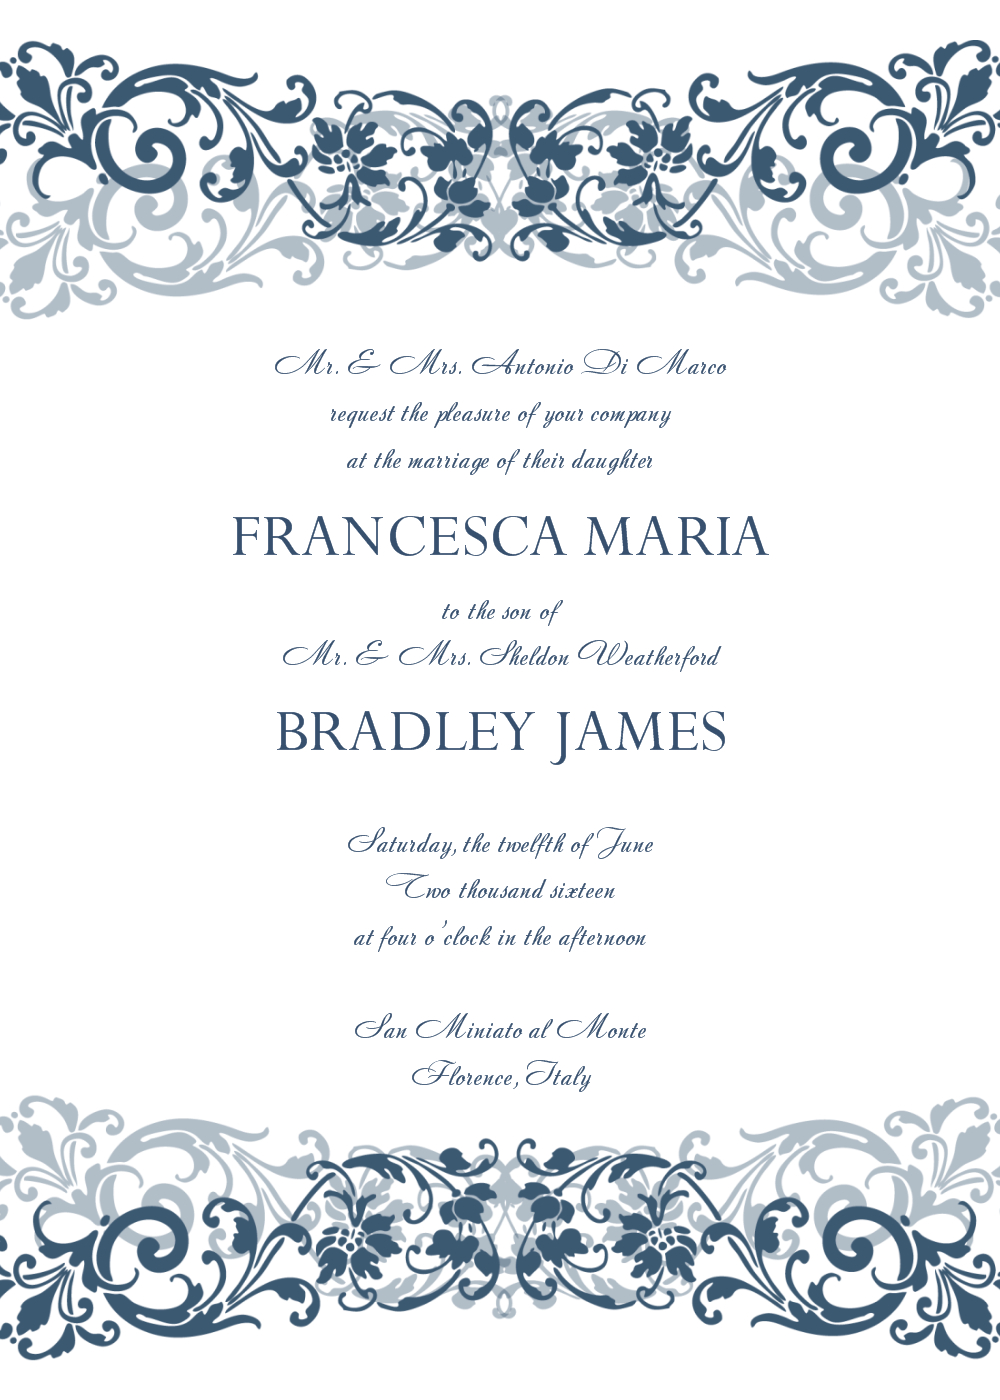 30+ Free Wedding Invitations Templates | 21St - Bridal World - Free Printable Wedding Invitations With Photo